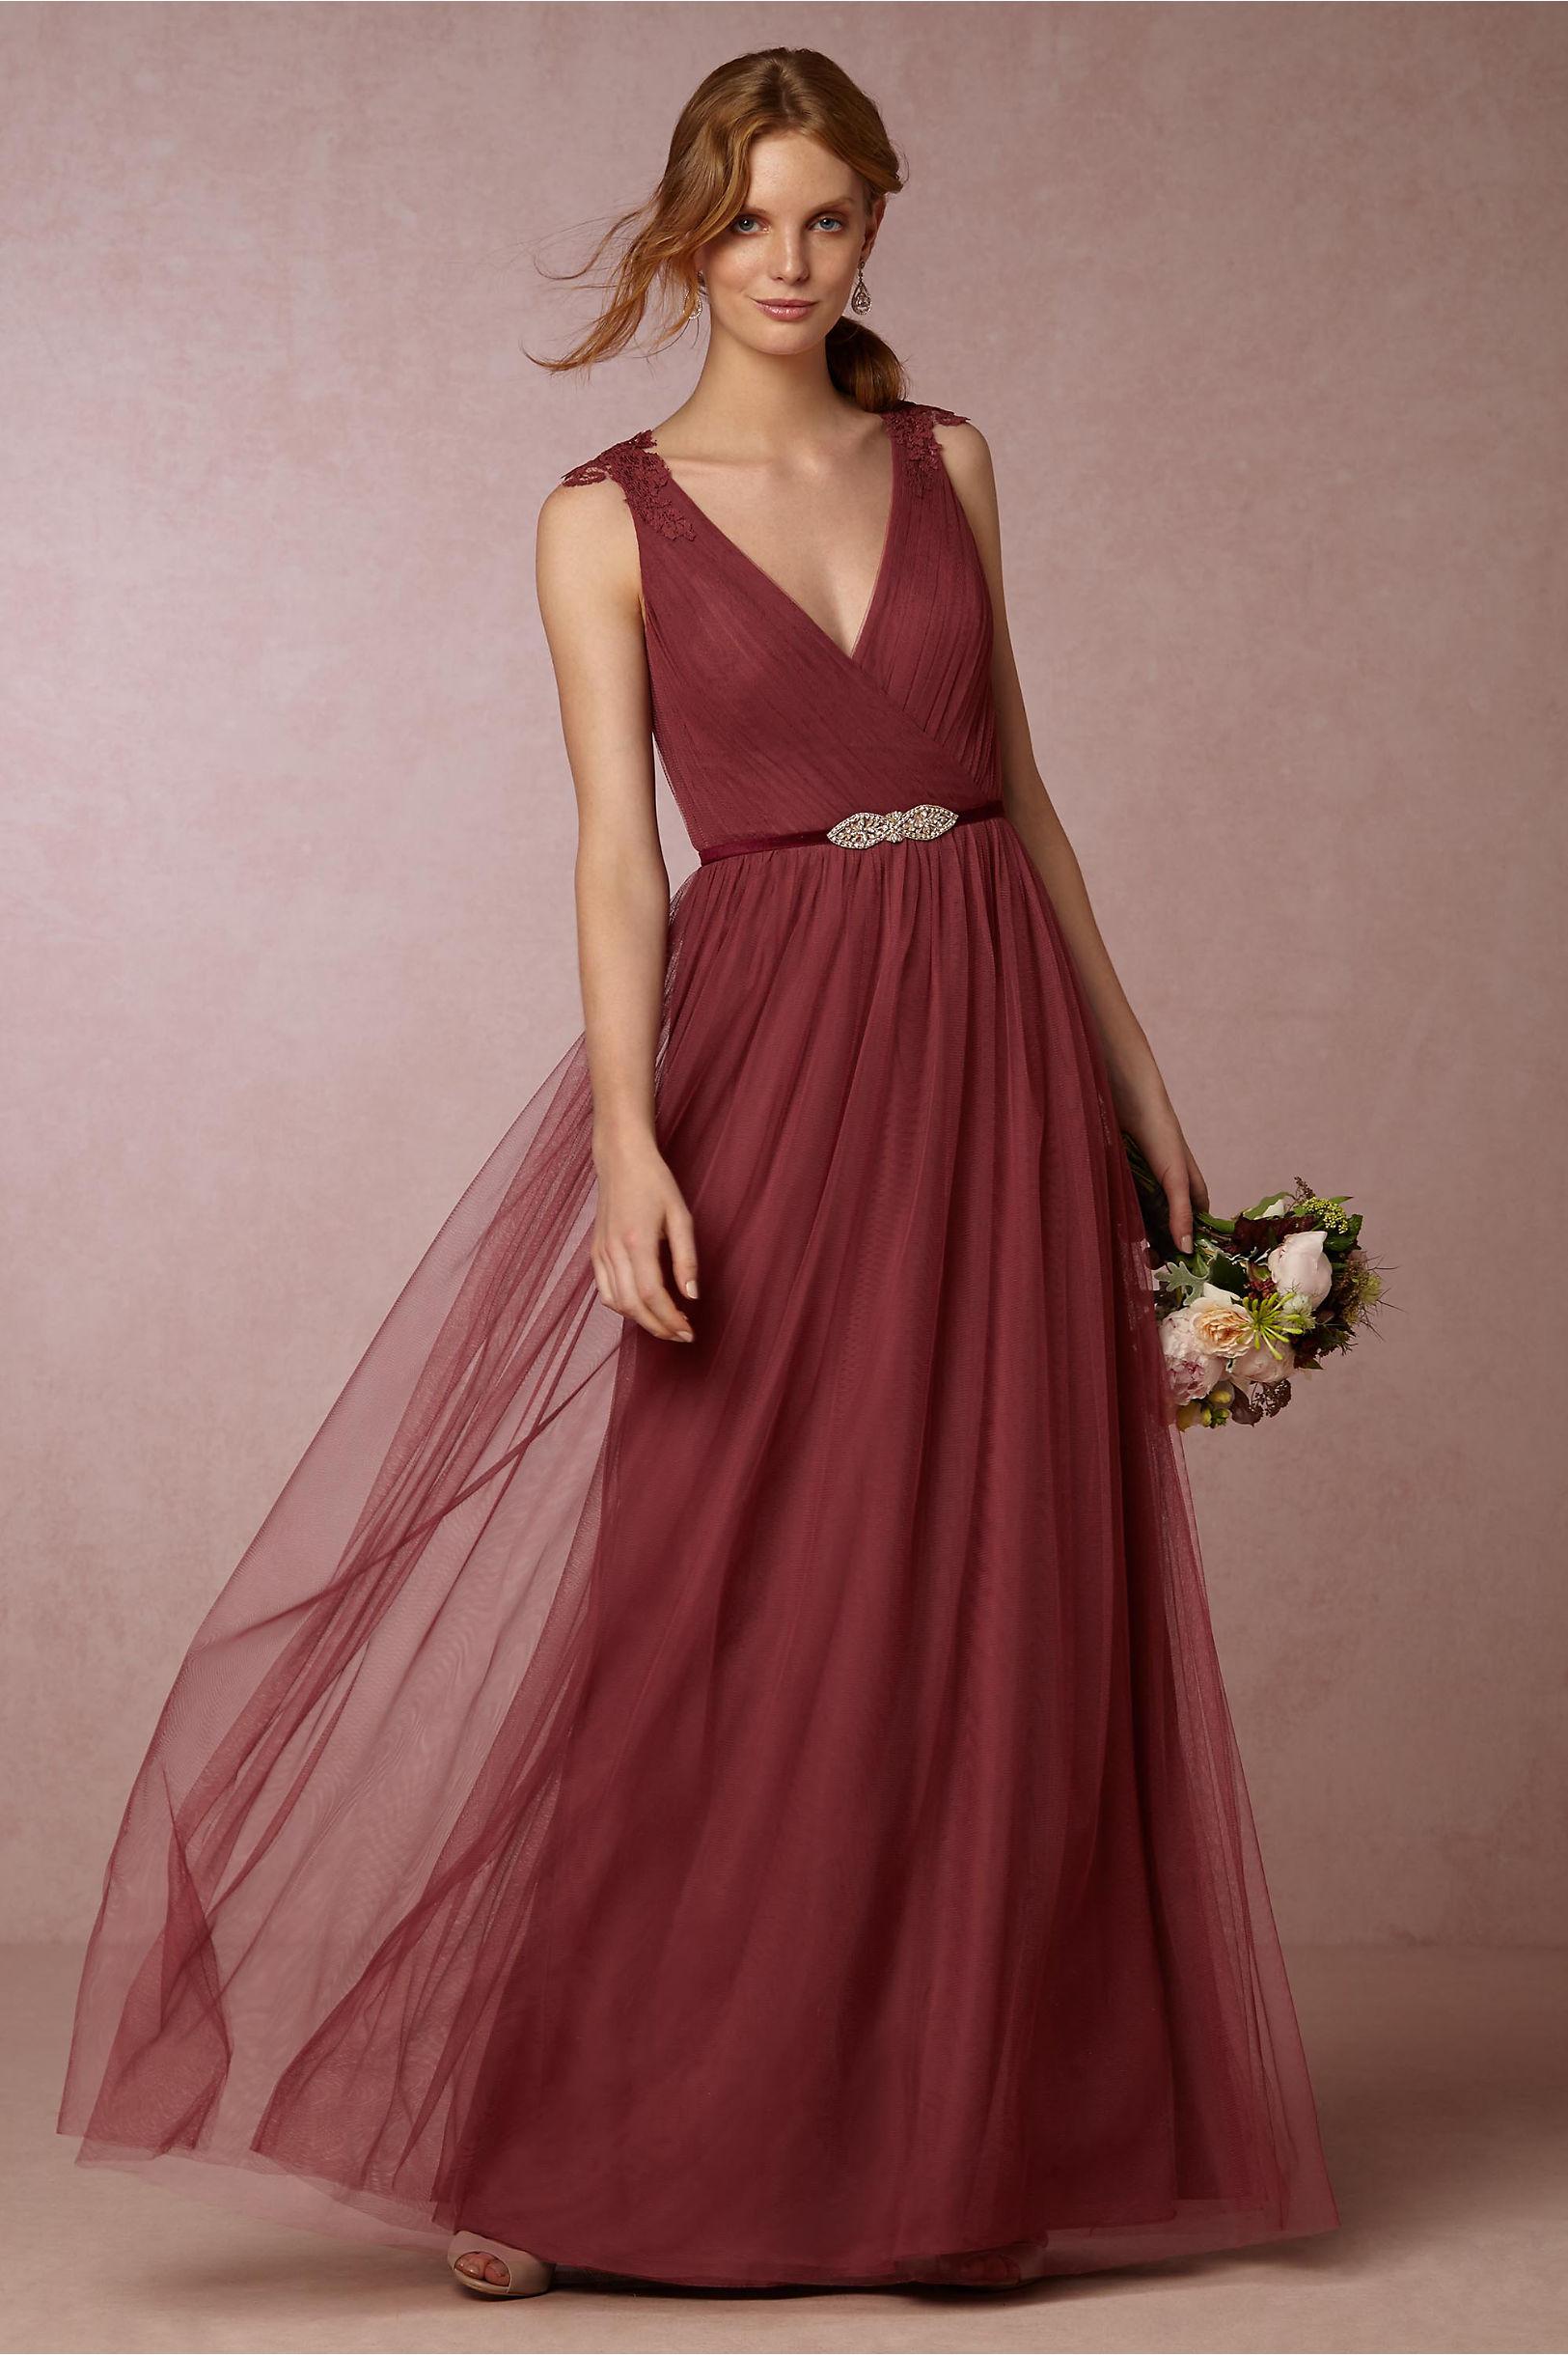 Pippa Dress in Sale | BHLDN